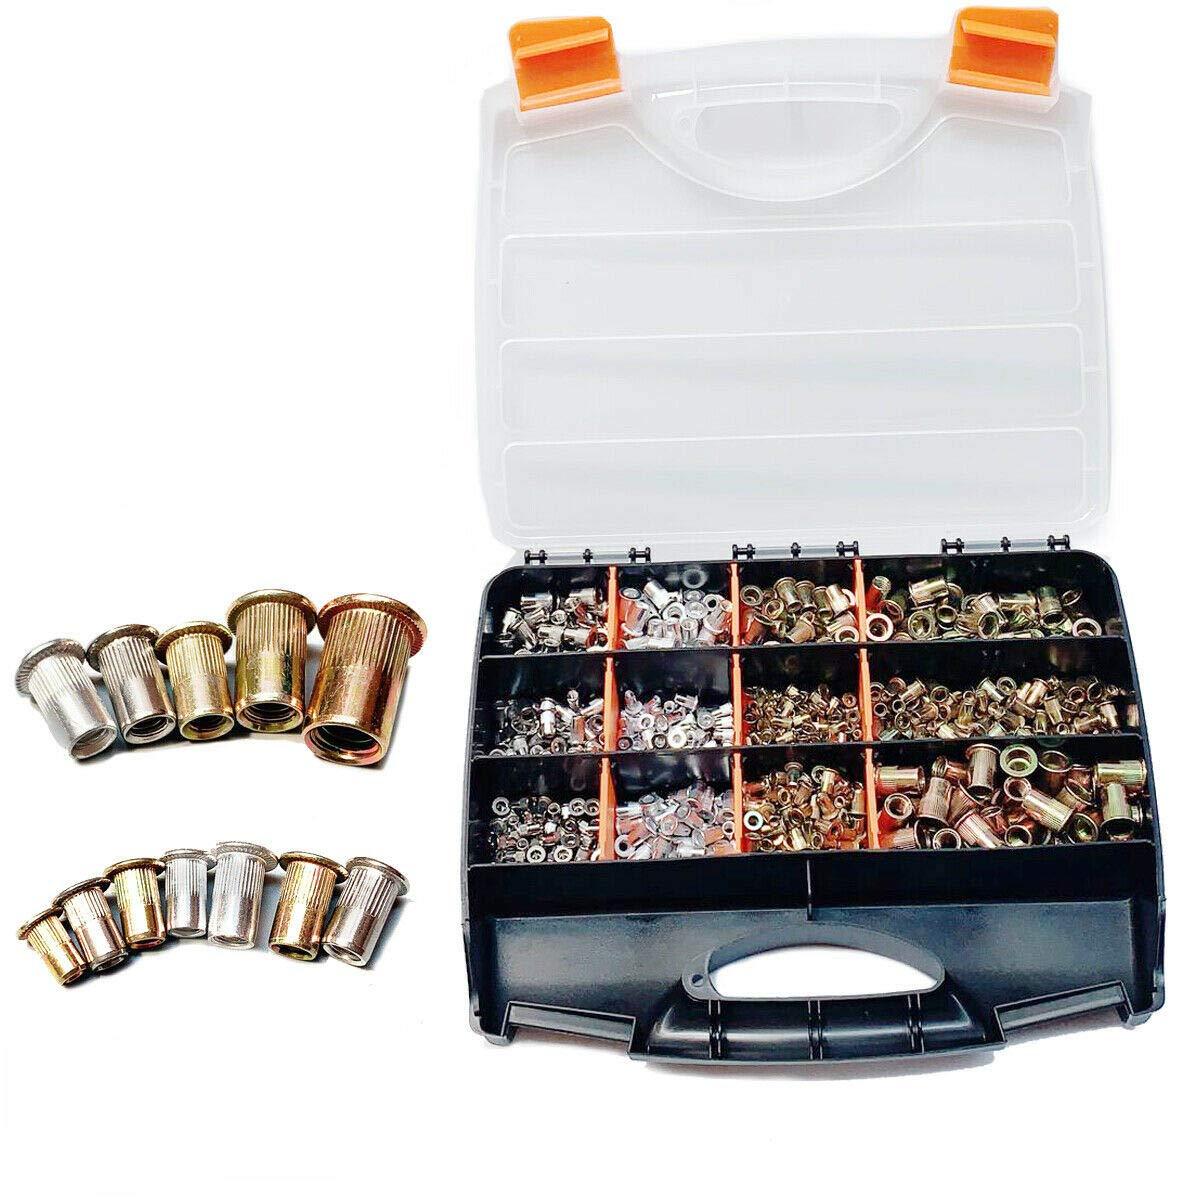 HOTSTORE 900pcs Rivet Nuts Assortment Kit, Stainless Steel Flat Head Threaded Insert Nutsert Rivet Nut Assortment Kit -M3 M4 M5 M6 M8 M10 by HOTSTORE